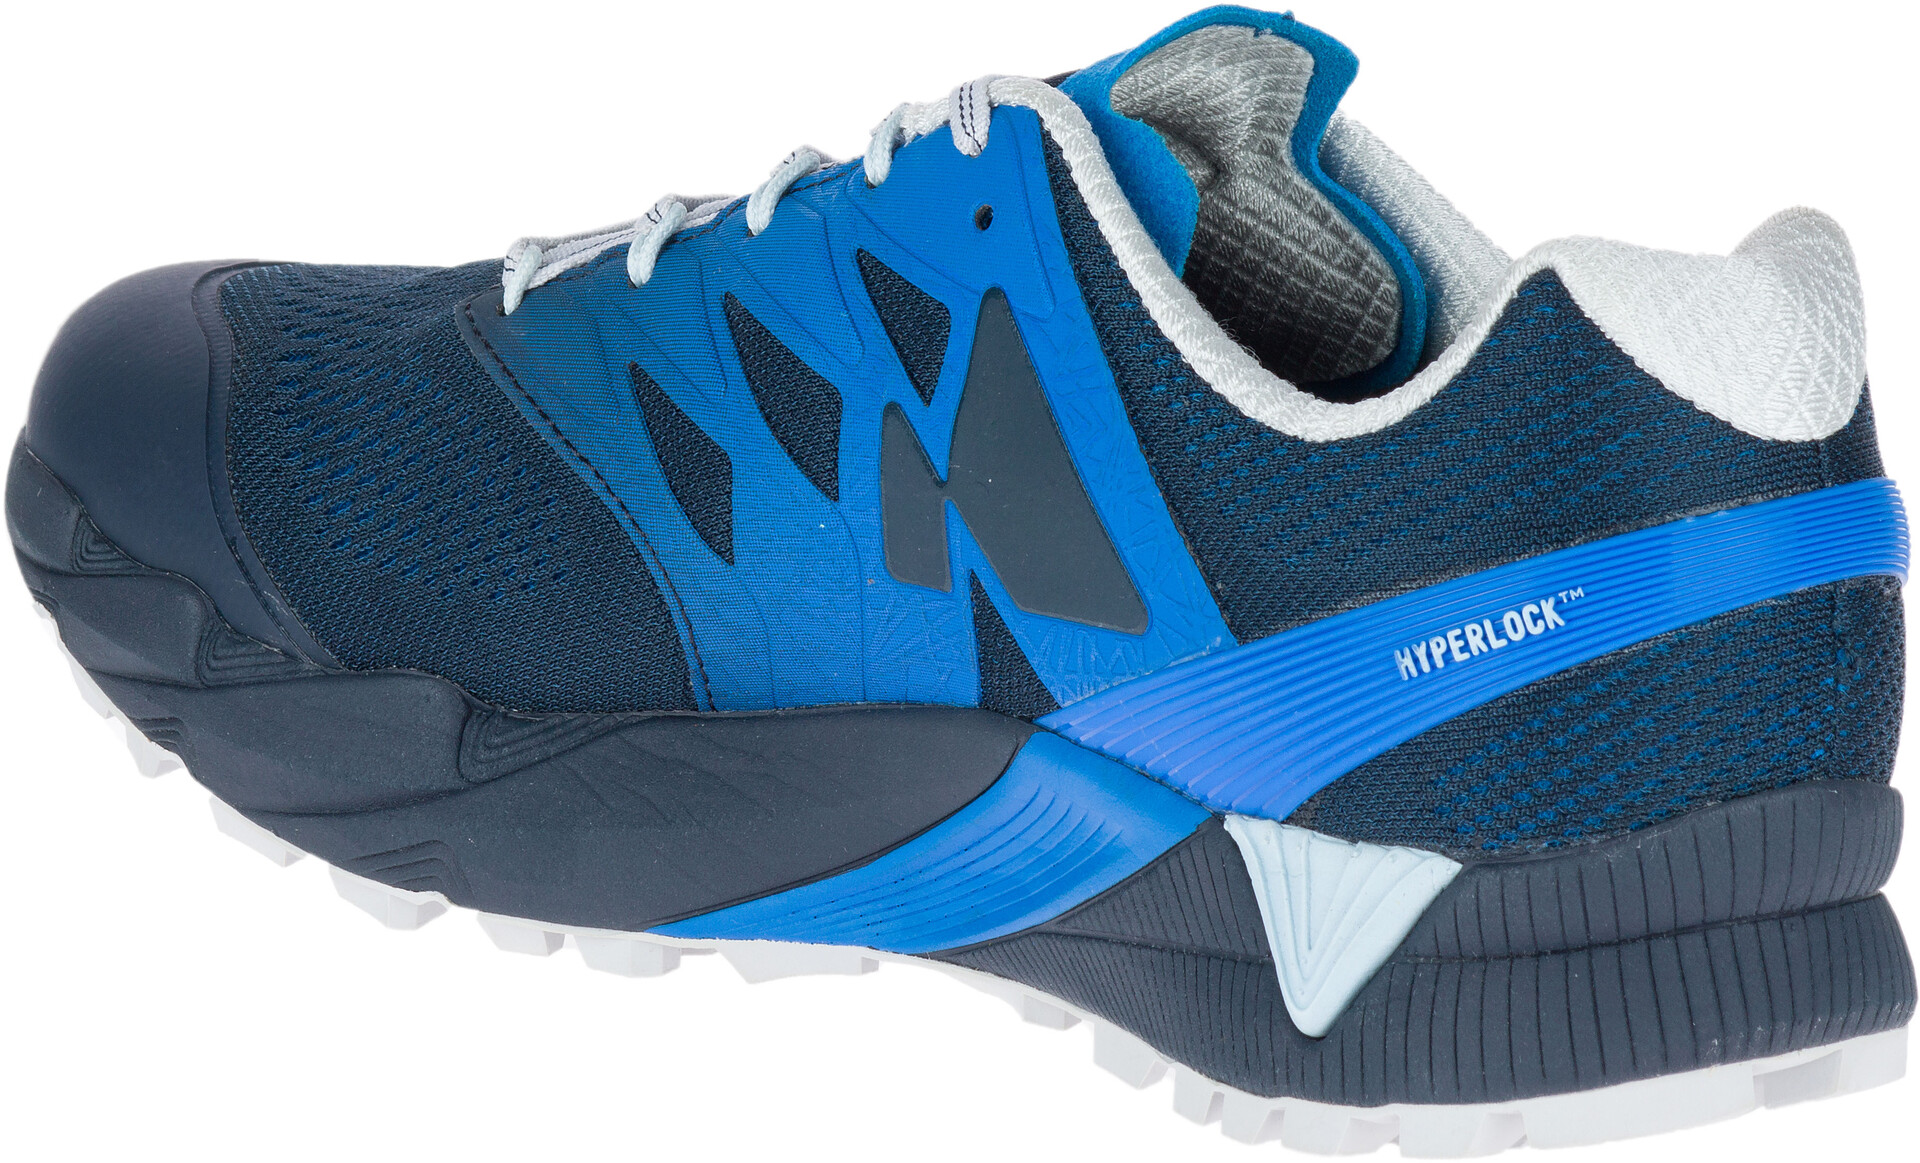 Peak Merrell Flex Homme Chaussures 2 Mesh bleu E running Agility CBxerod